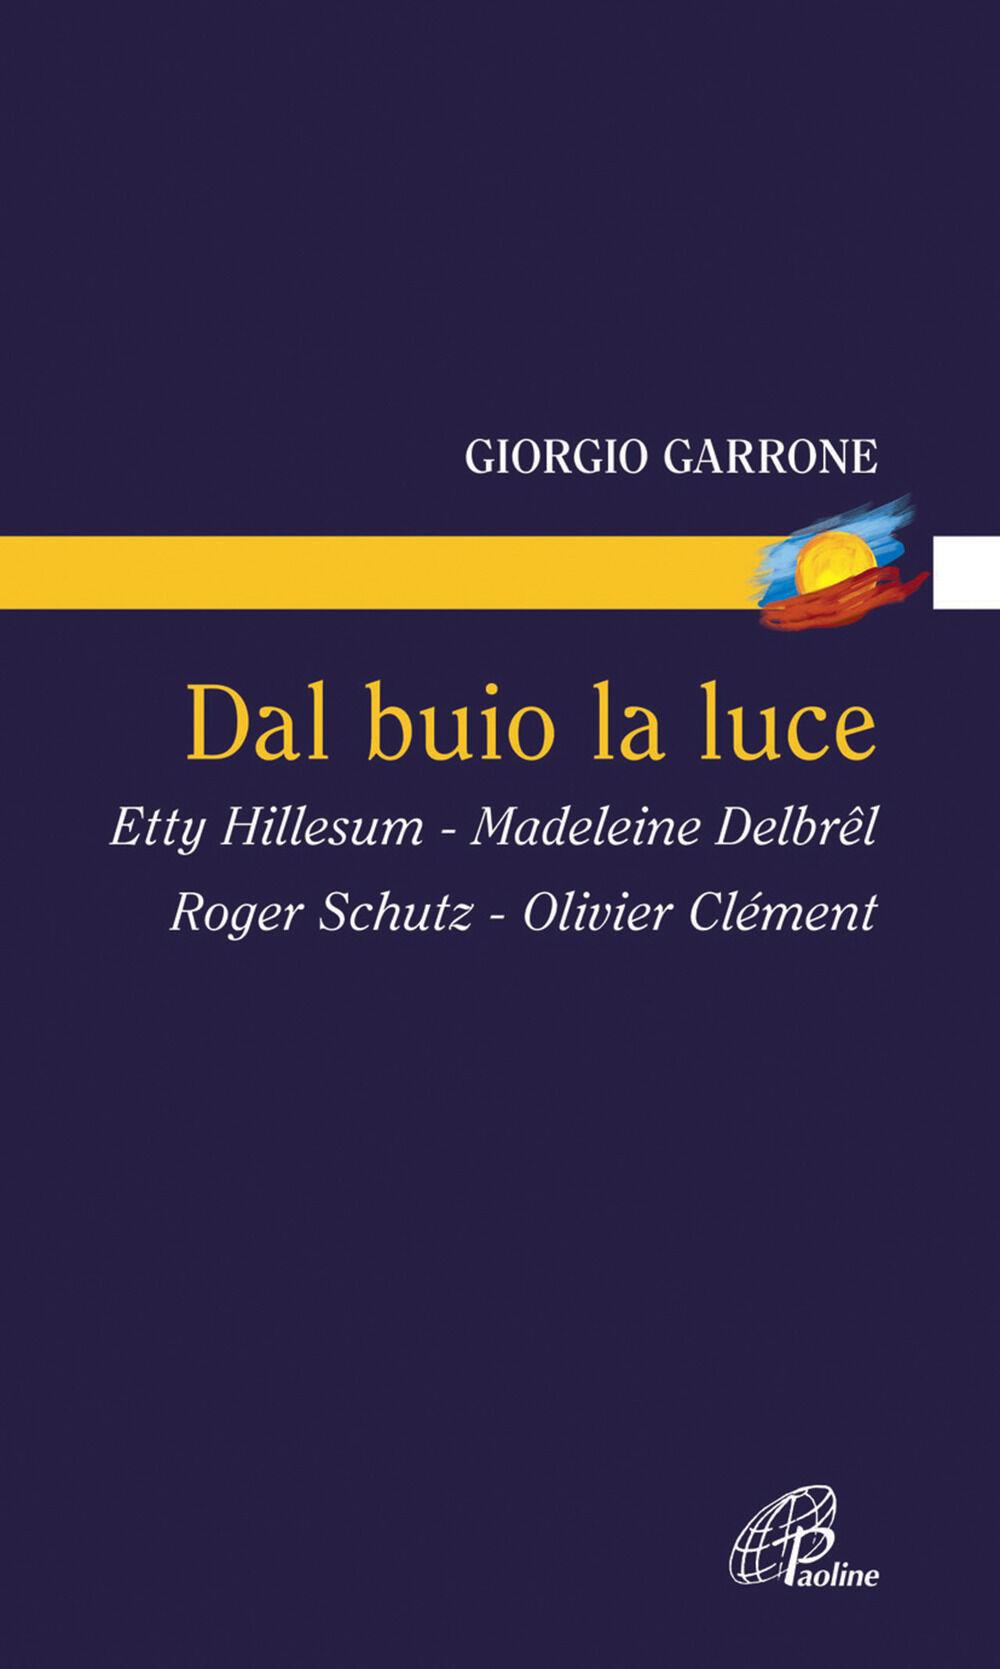 Dal buio la luce. Etty Hillesum, Madeleine Delbrel, Roger Schutz, Olivier Clement